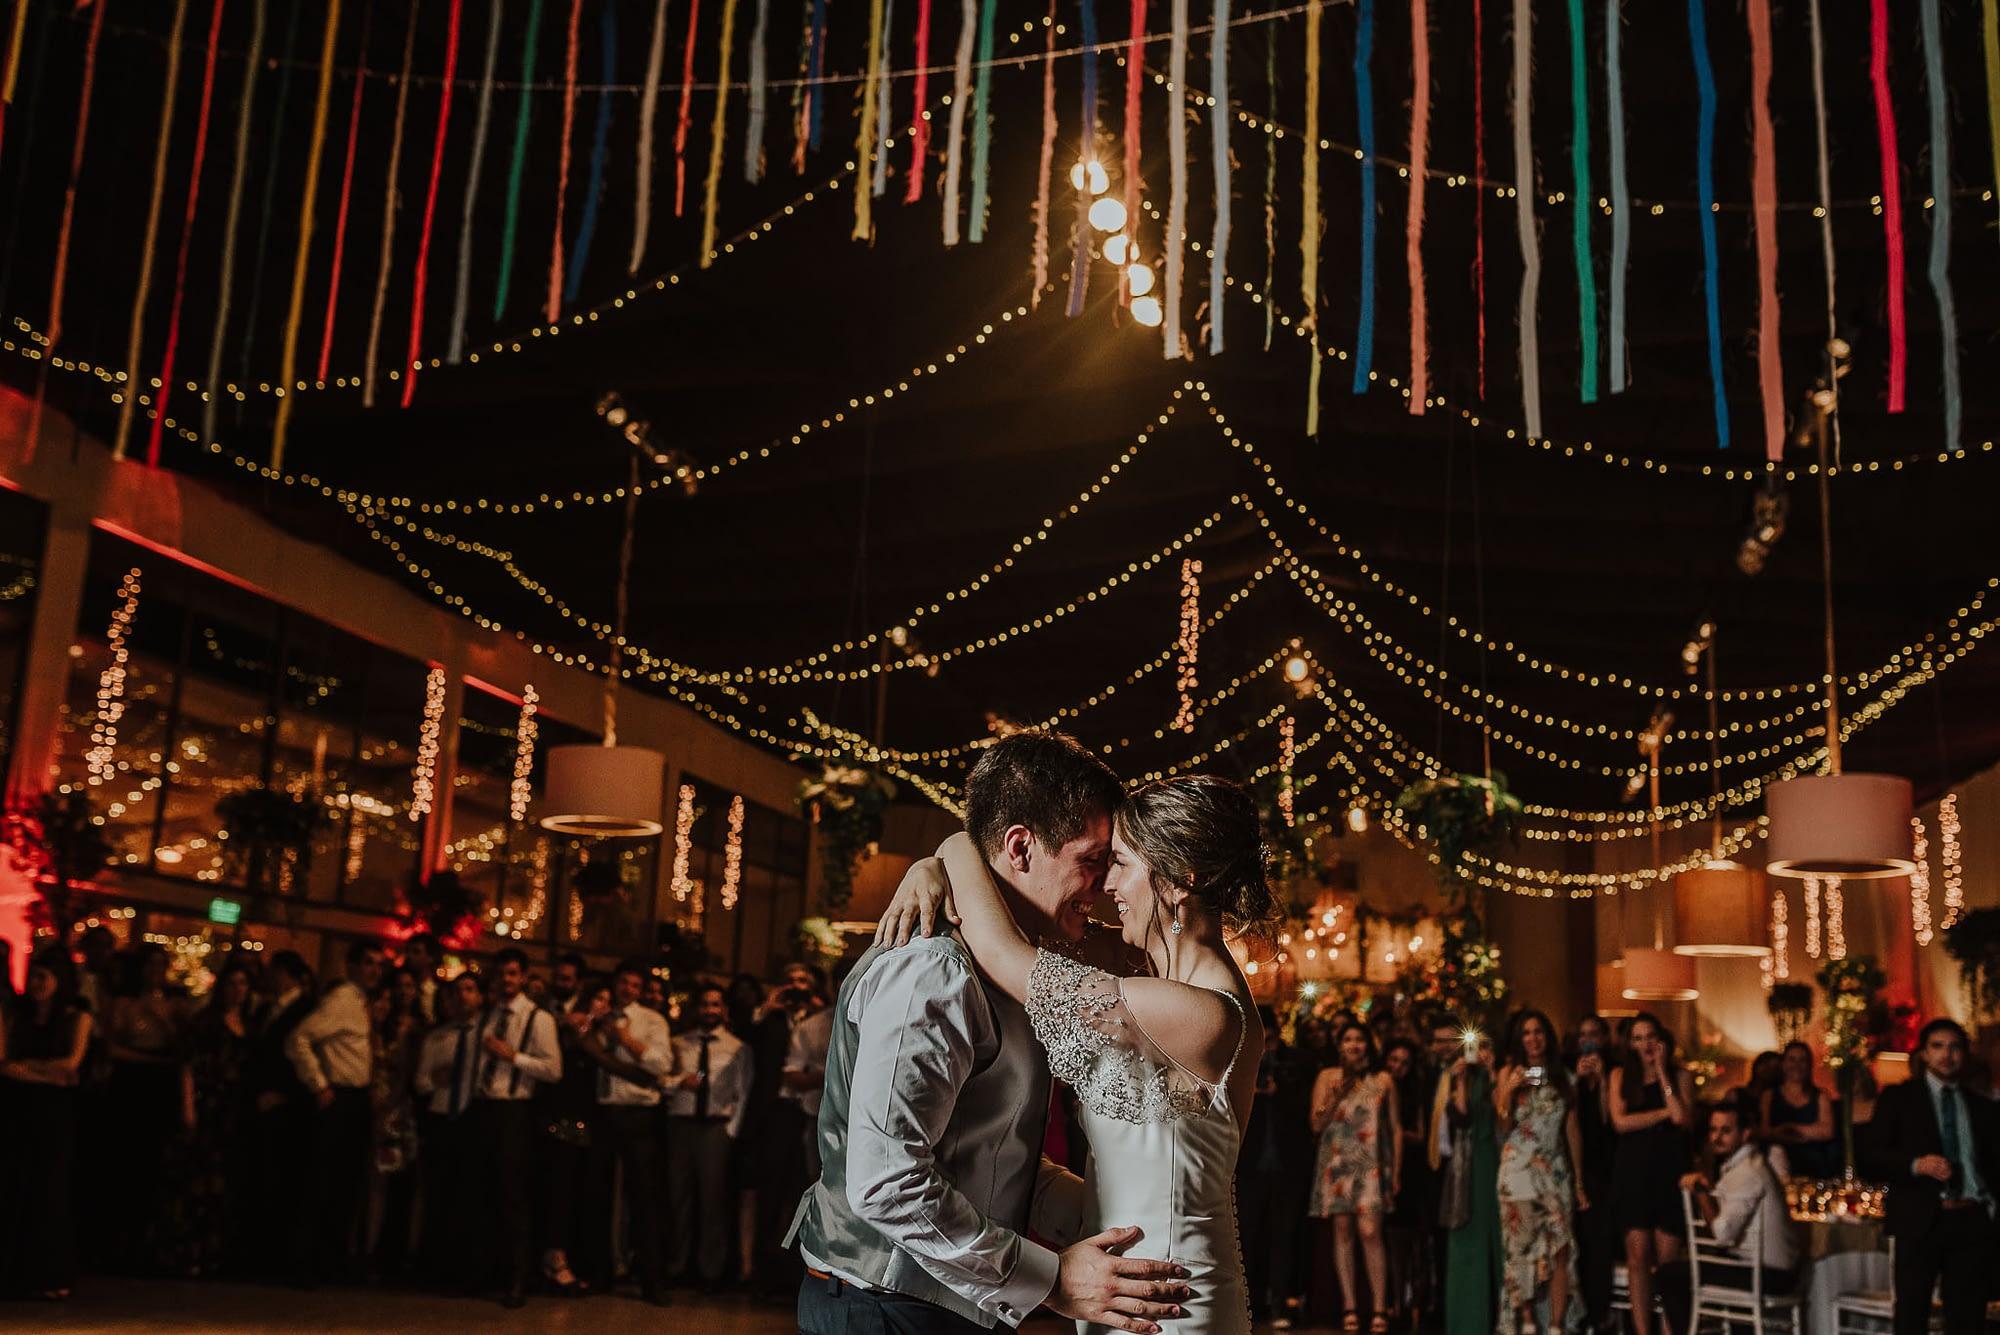 fotografo de matrimonios-los ingleses de chicureo-vals novios